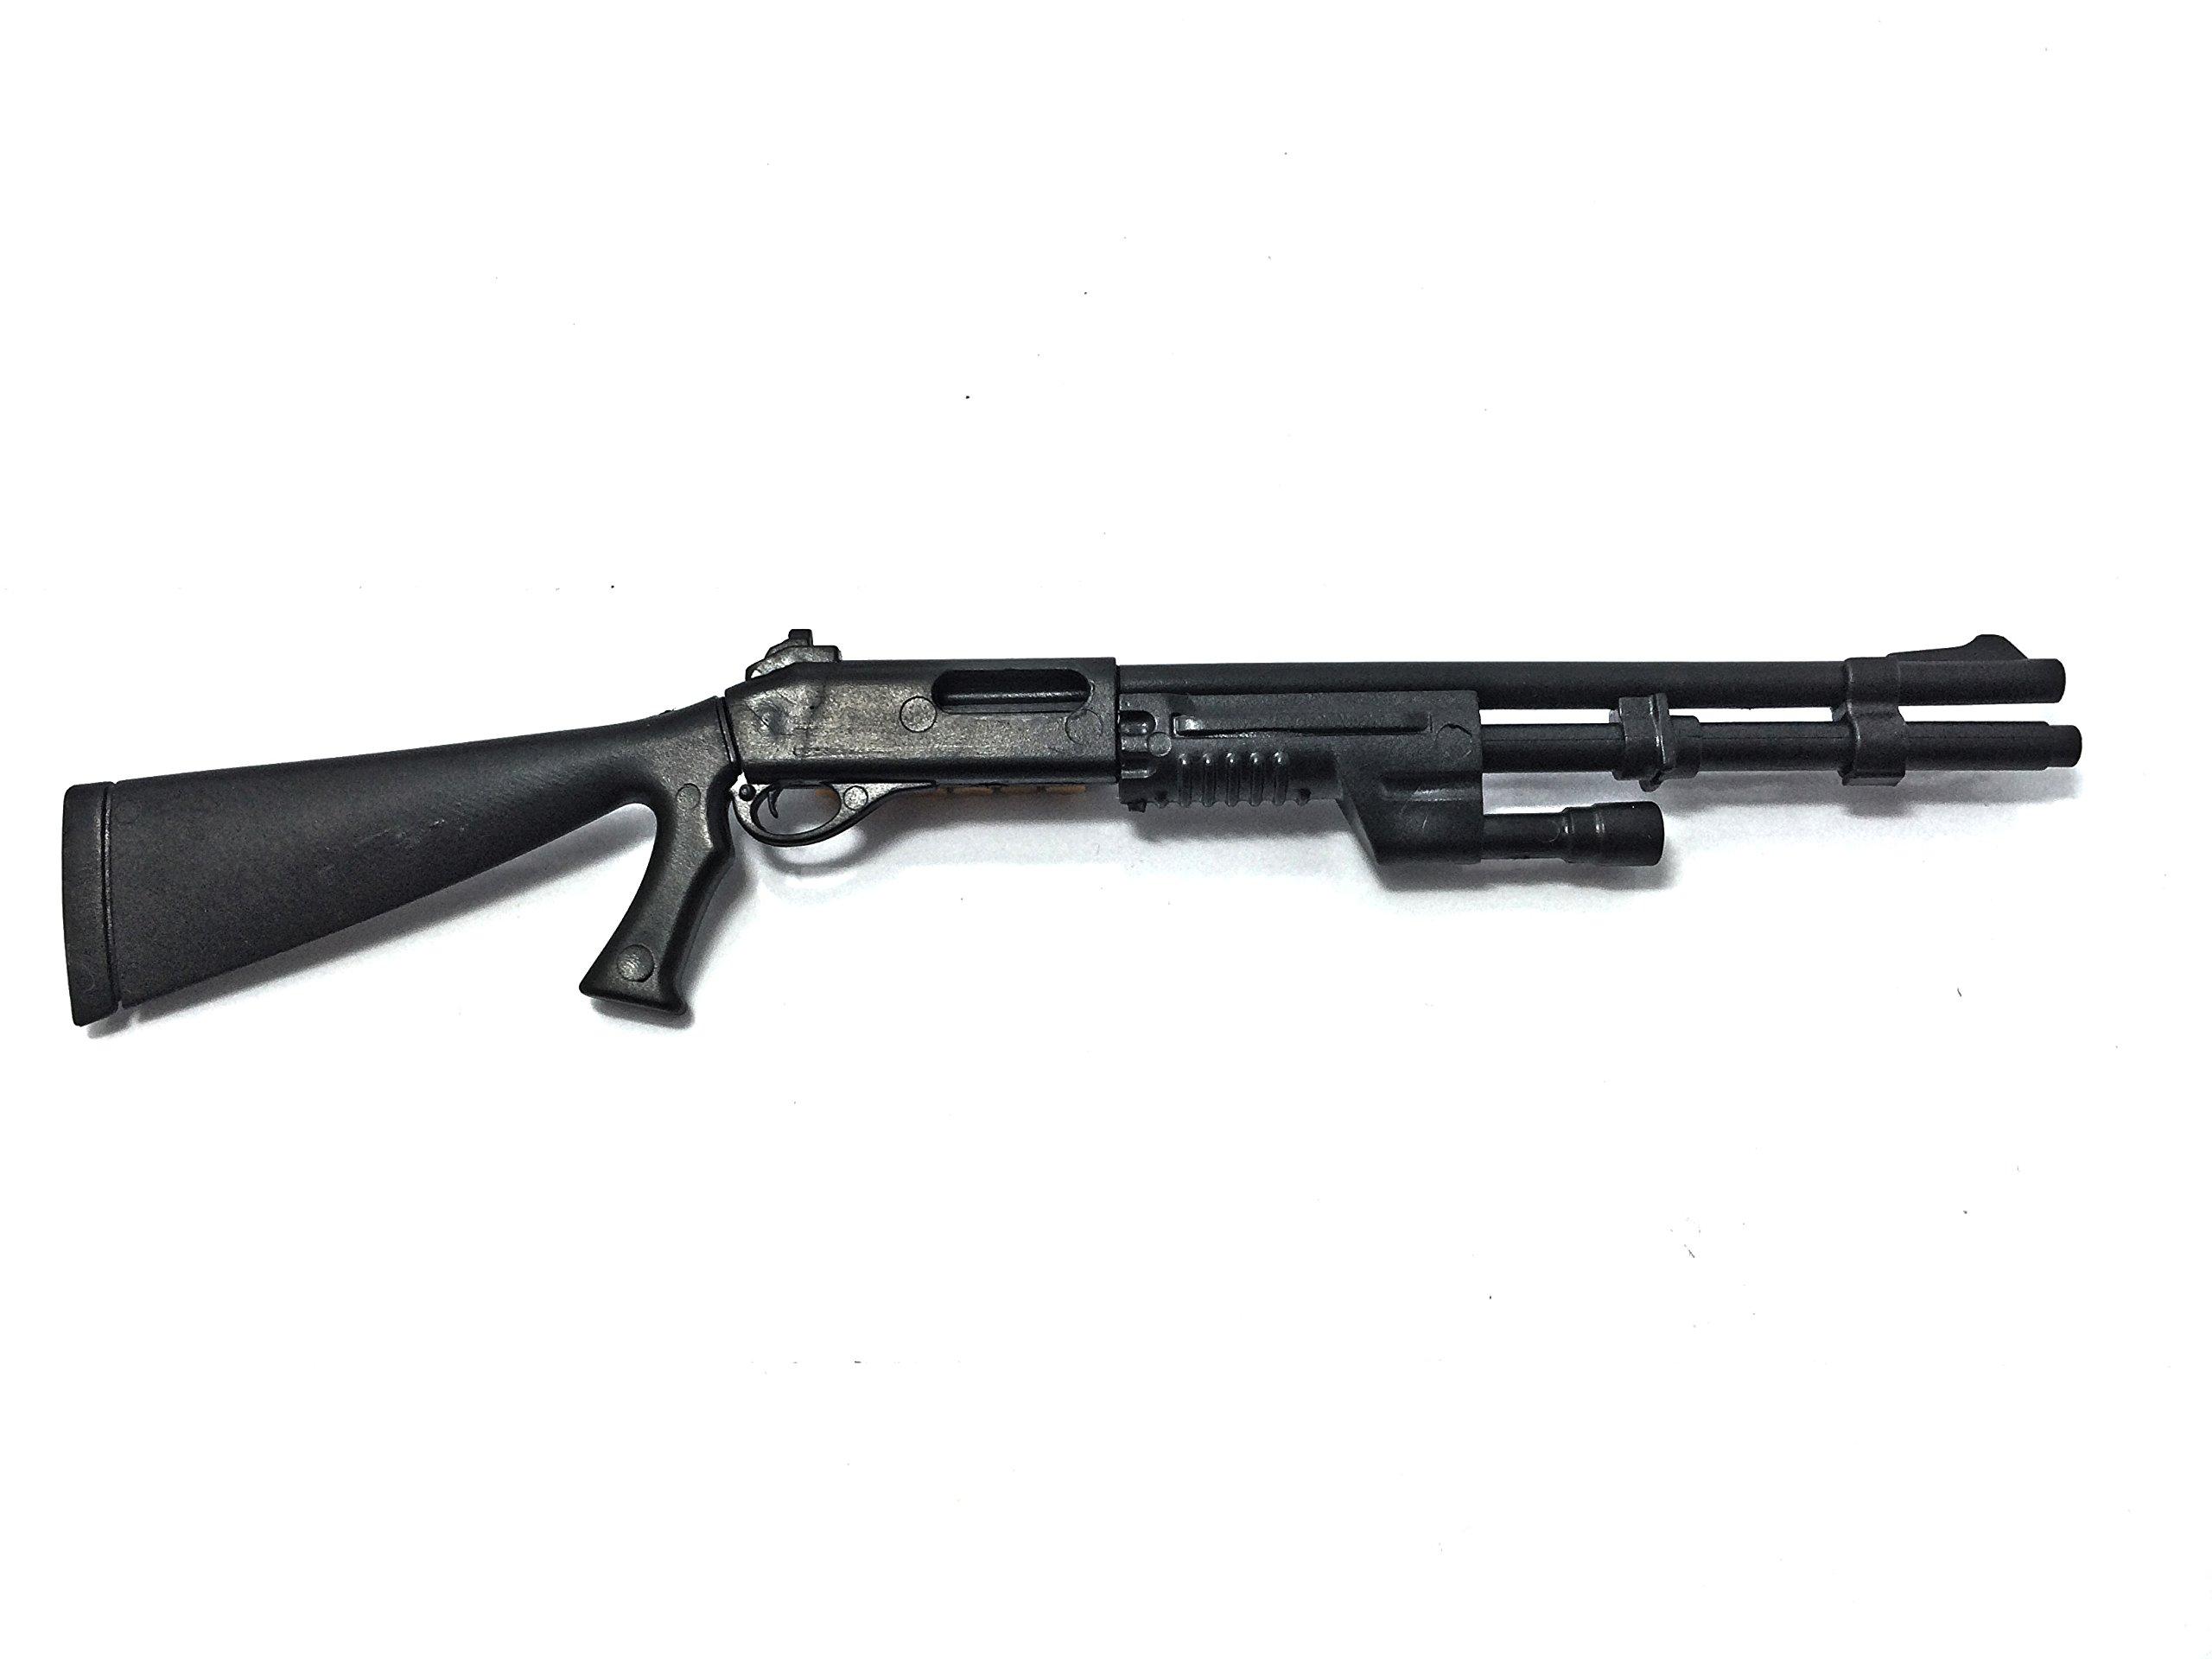 1//6 M1 Super 90 Shot Gun Model Assembling Accessories Weapon For Action Figures